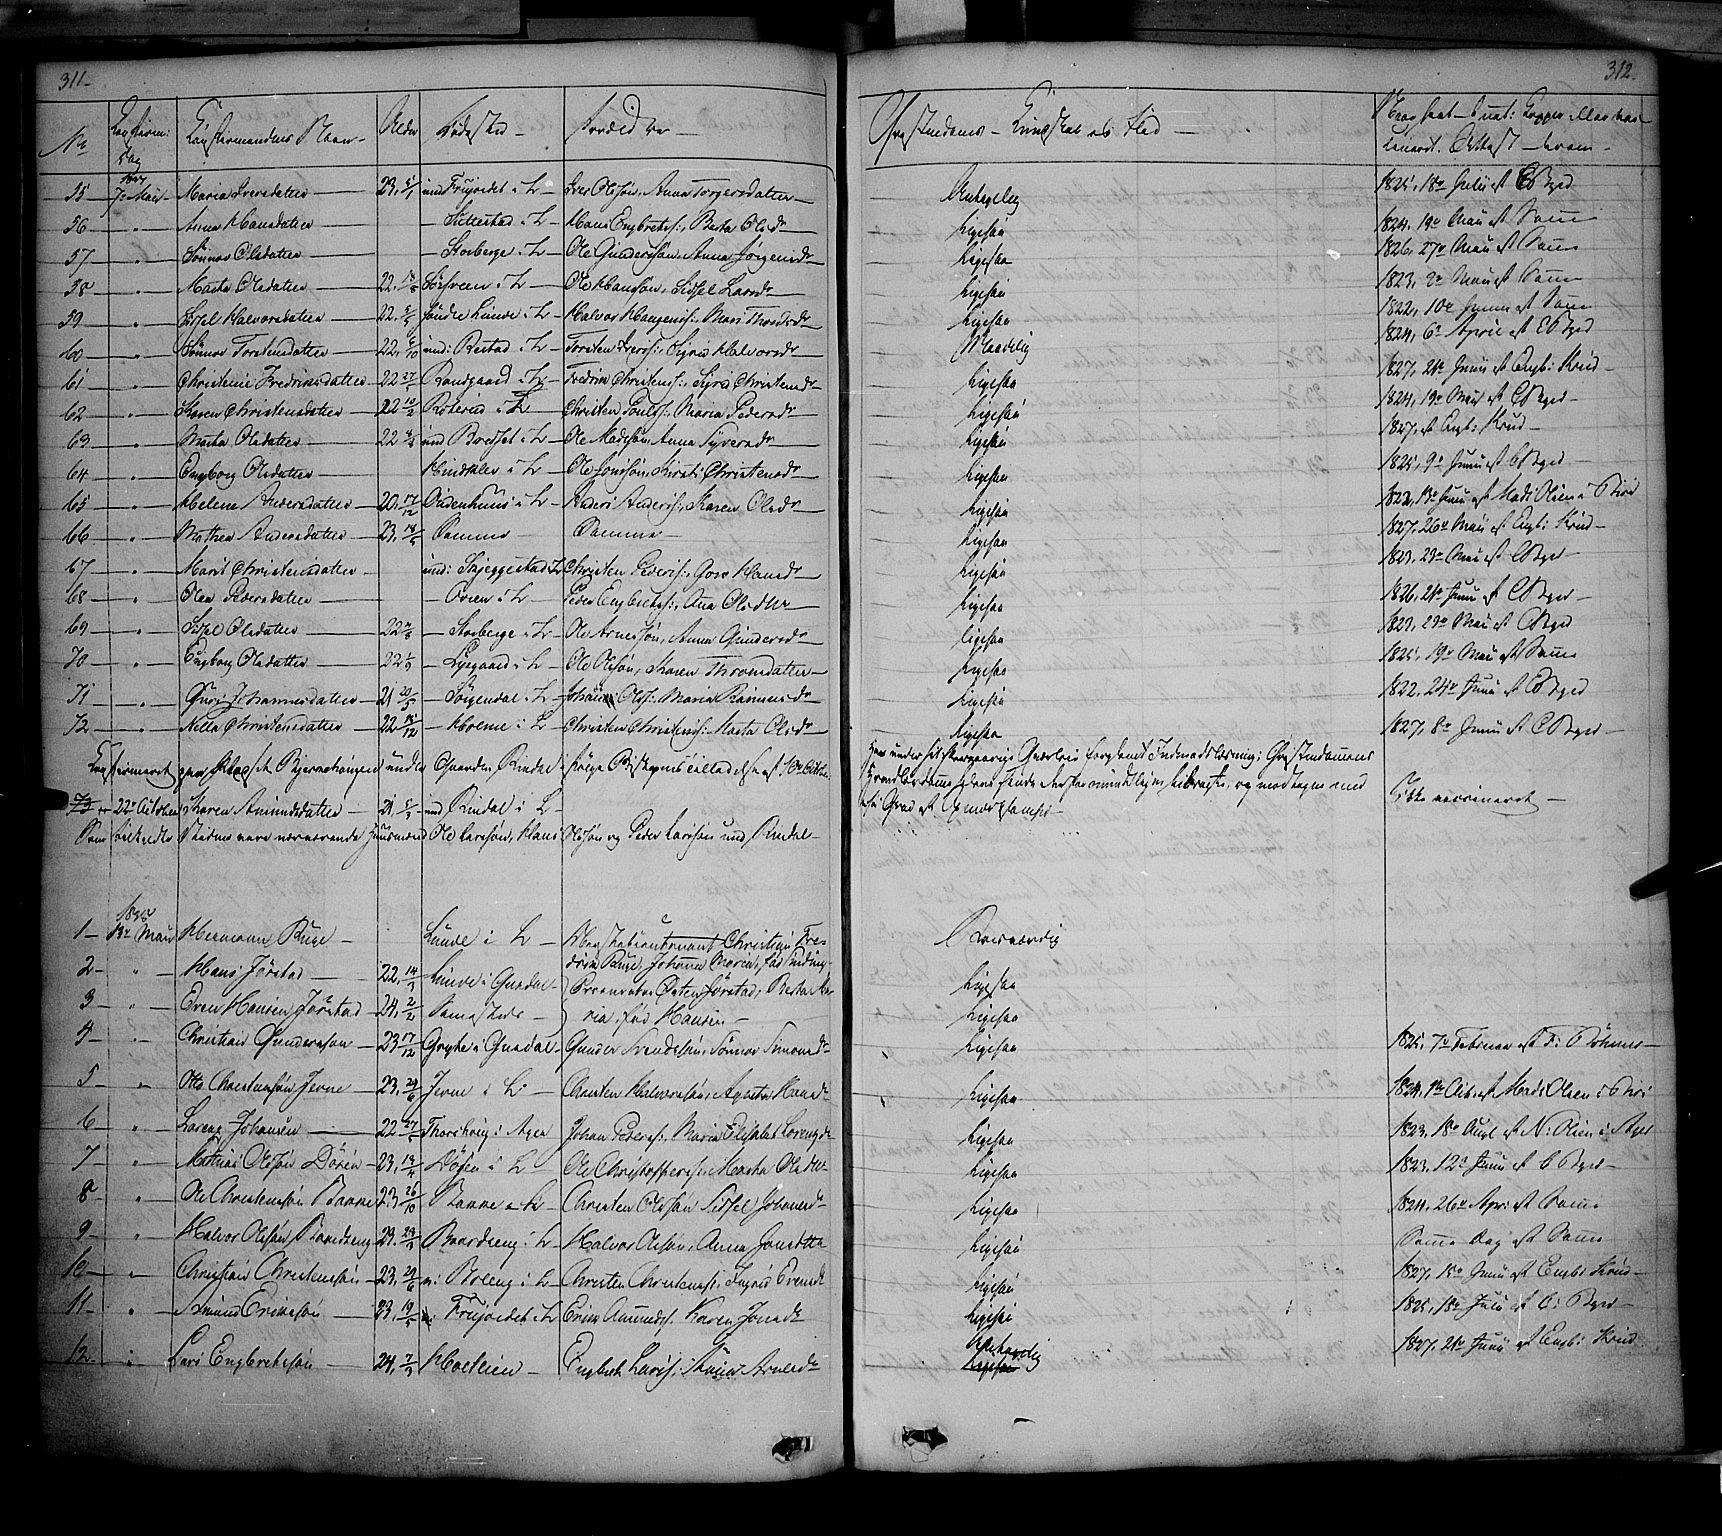 SAH, Fåberg prestekontor, Ministerialbok nr. 5, 1836-1854, s. 311-312